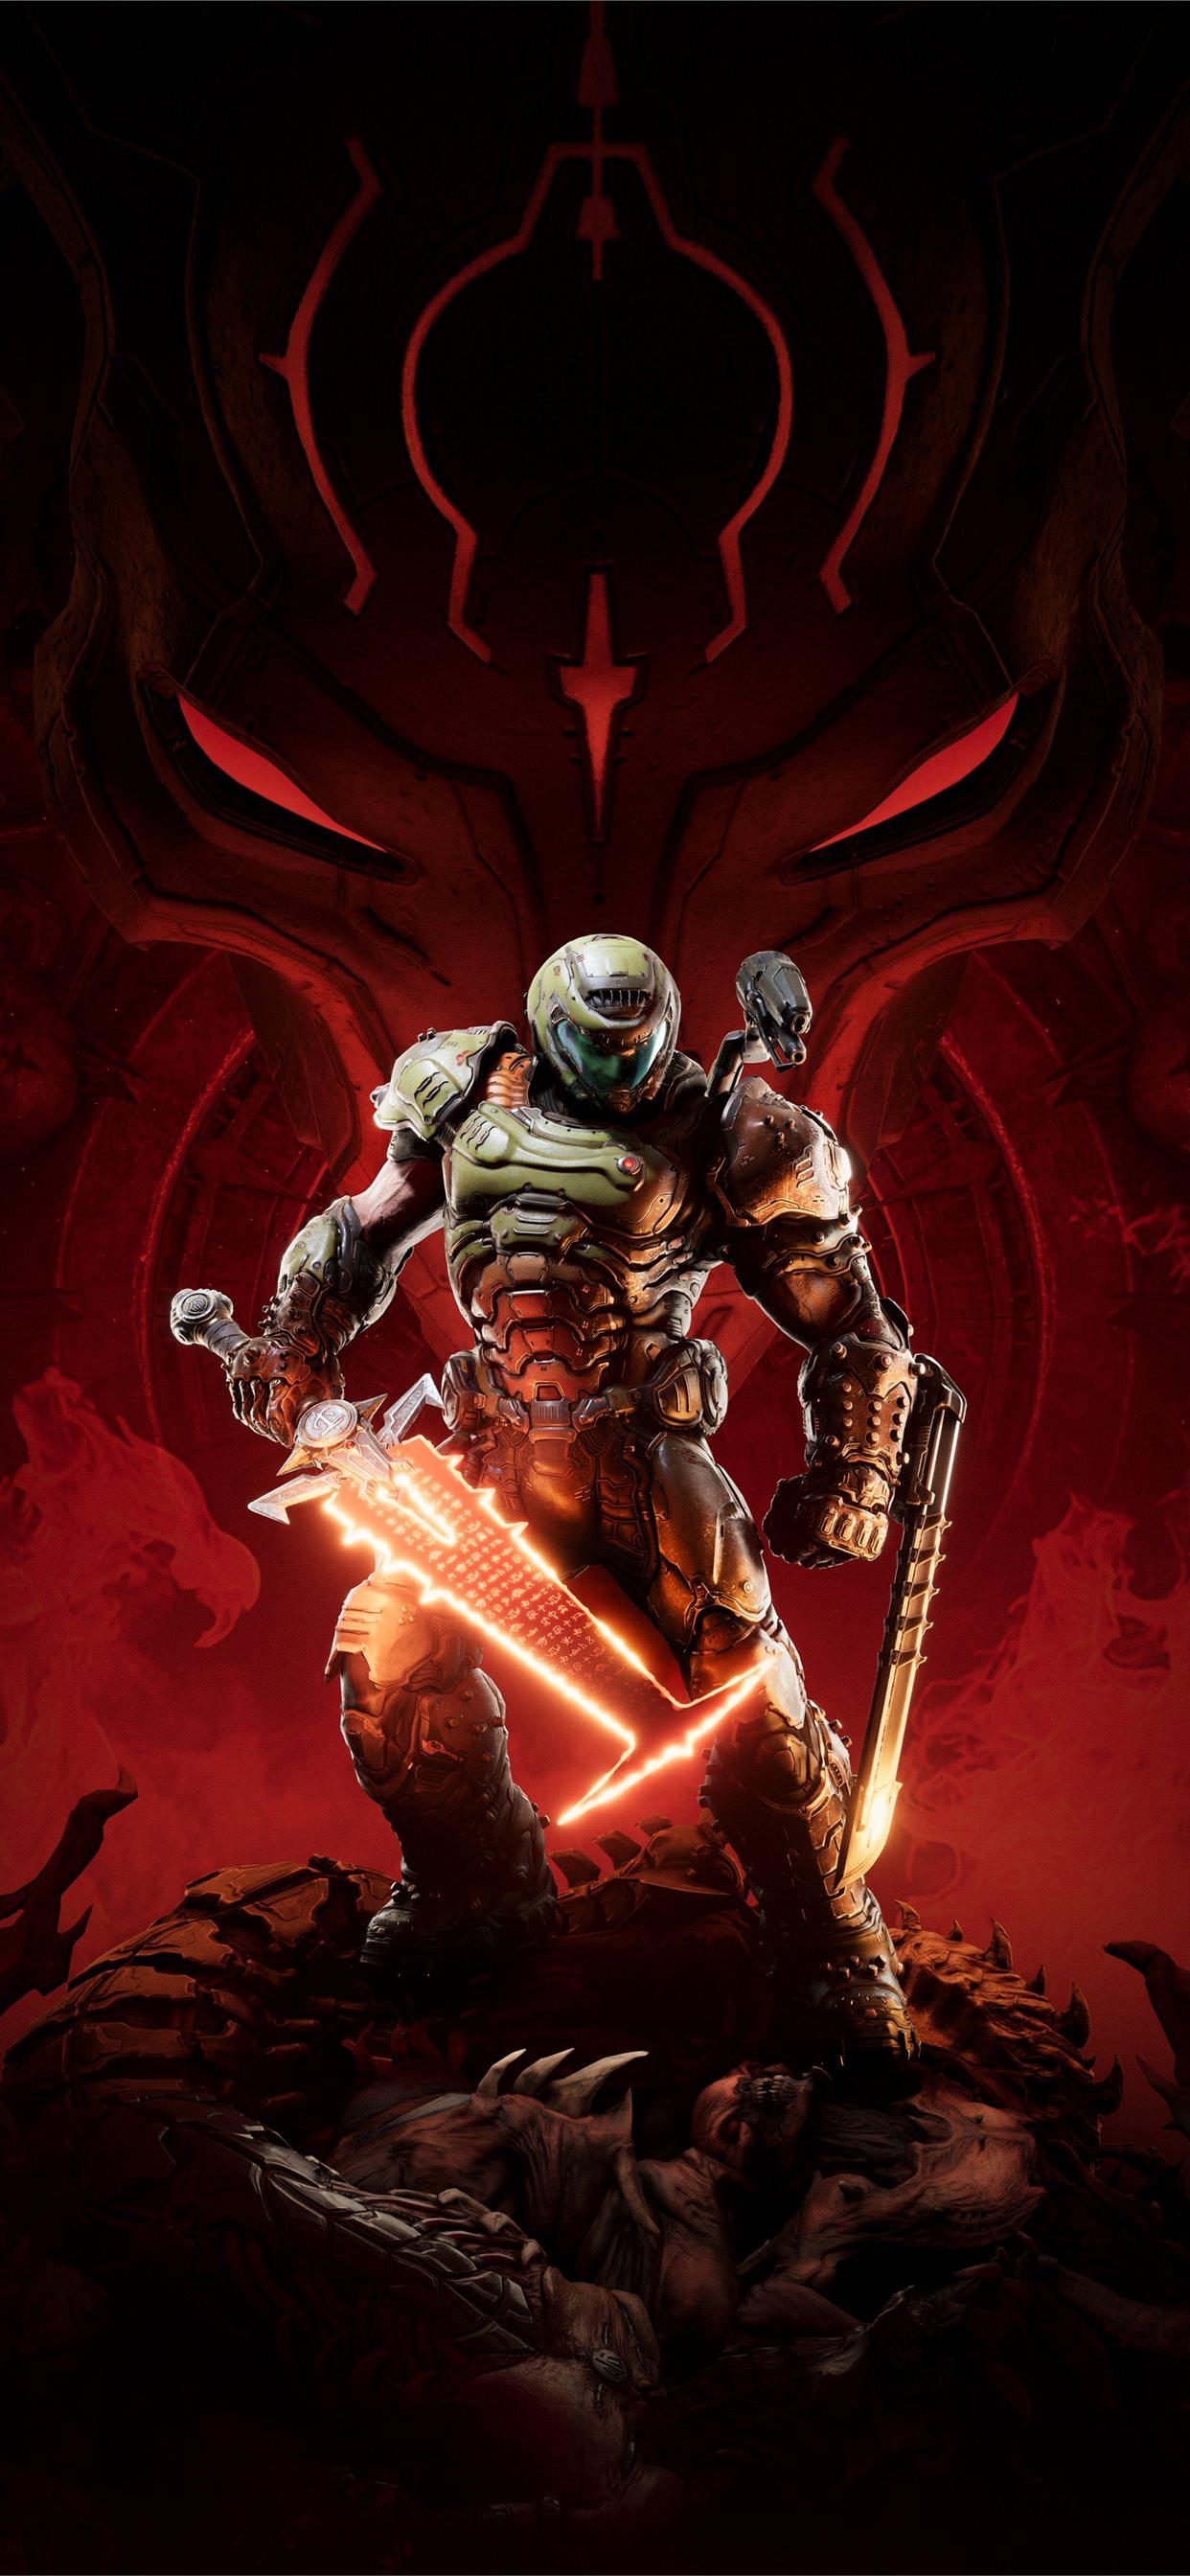 Doom Eternal 5k Game Iphone X Wallpapers Free Download